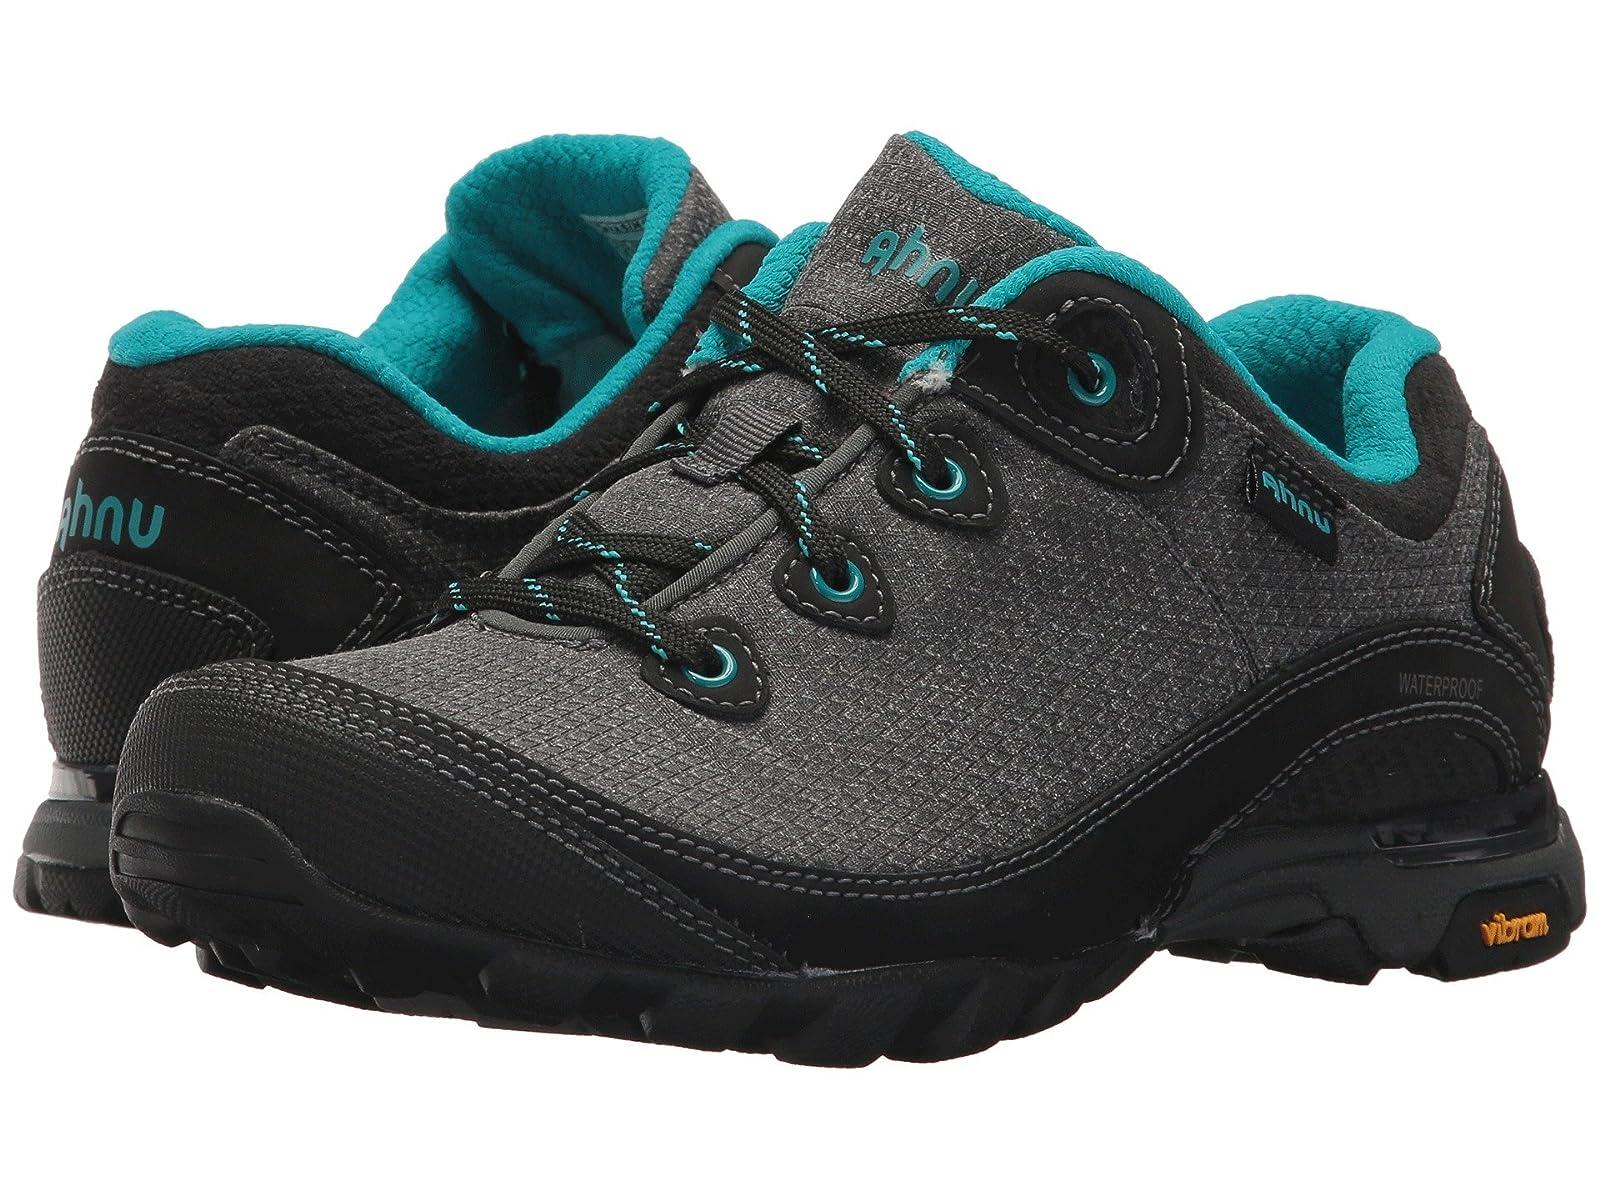 Teva Sugarpine II WPAtmospheric grades have affordable shoes